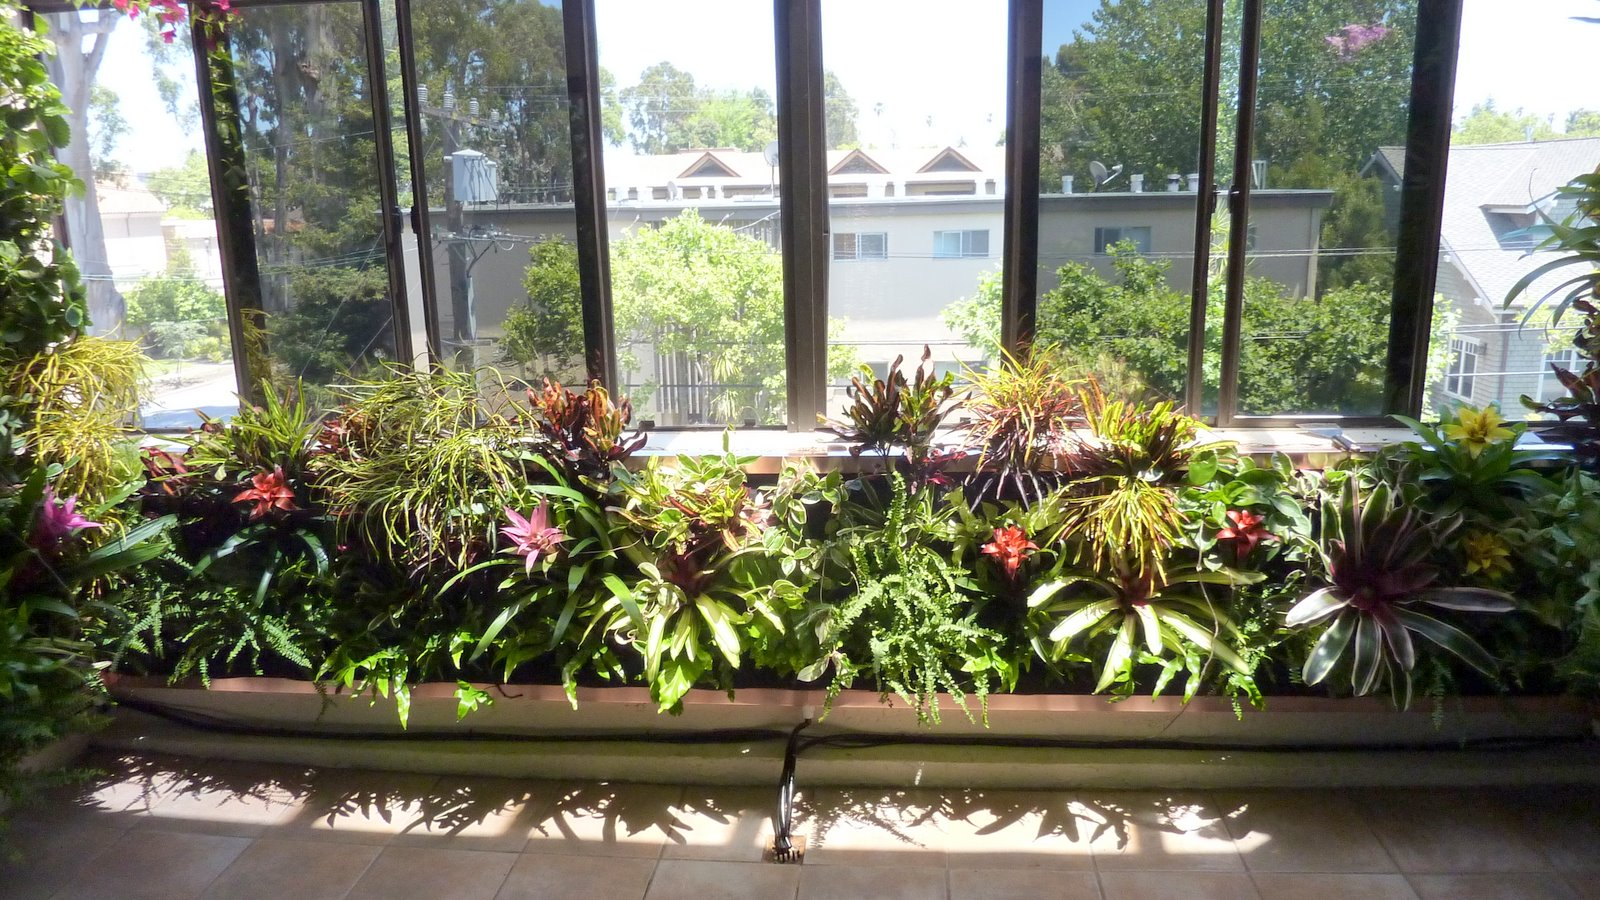 Atrium garden for Atrium garden window